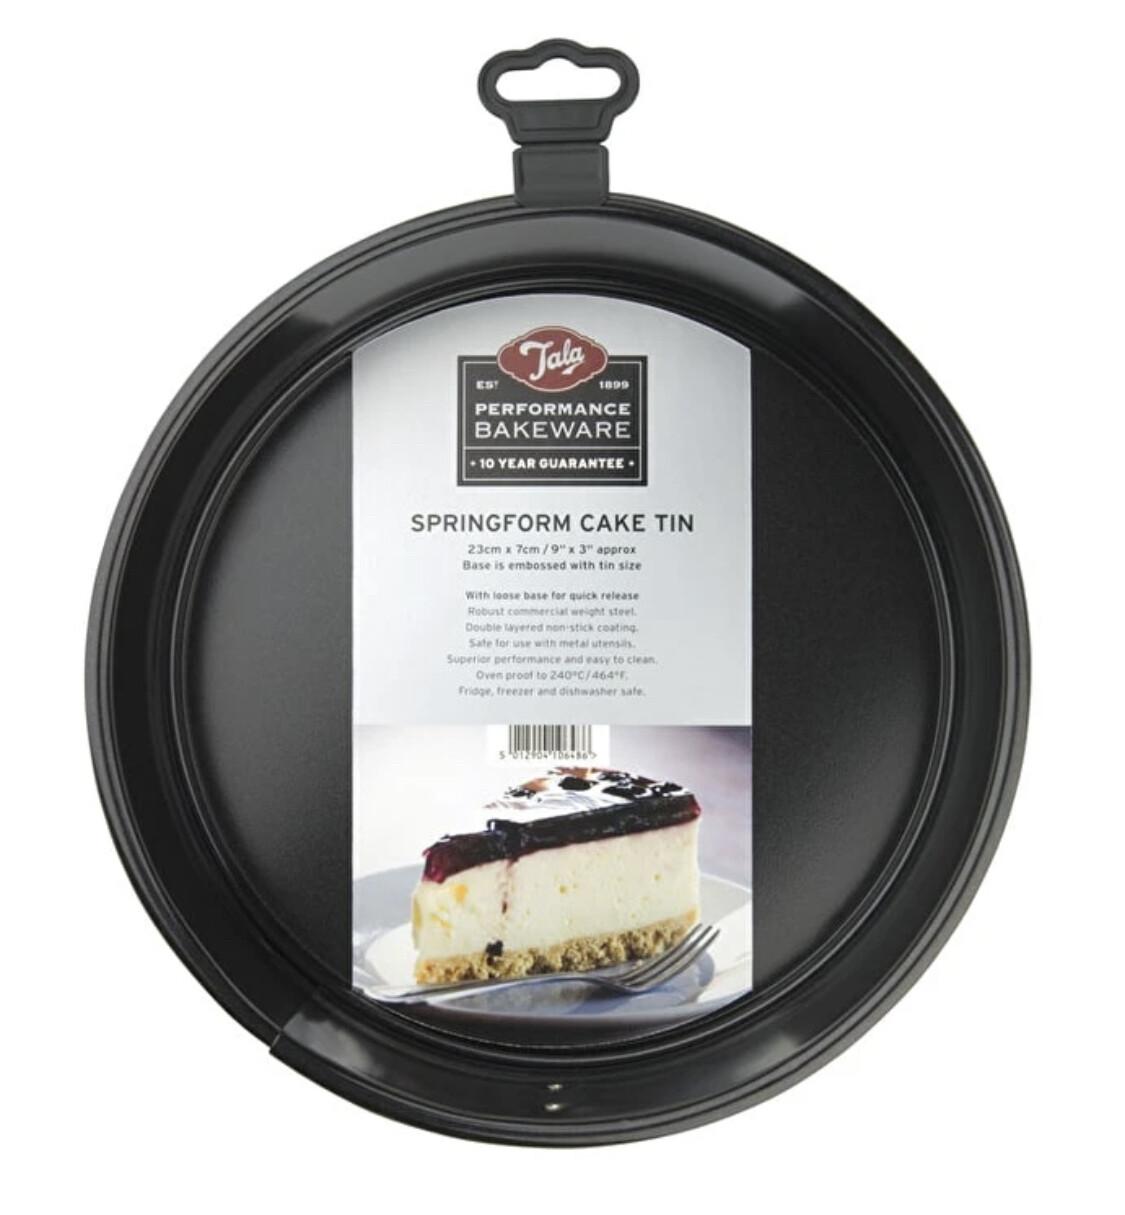 Tala - Performance Springform Cake Tin (23cm)